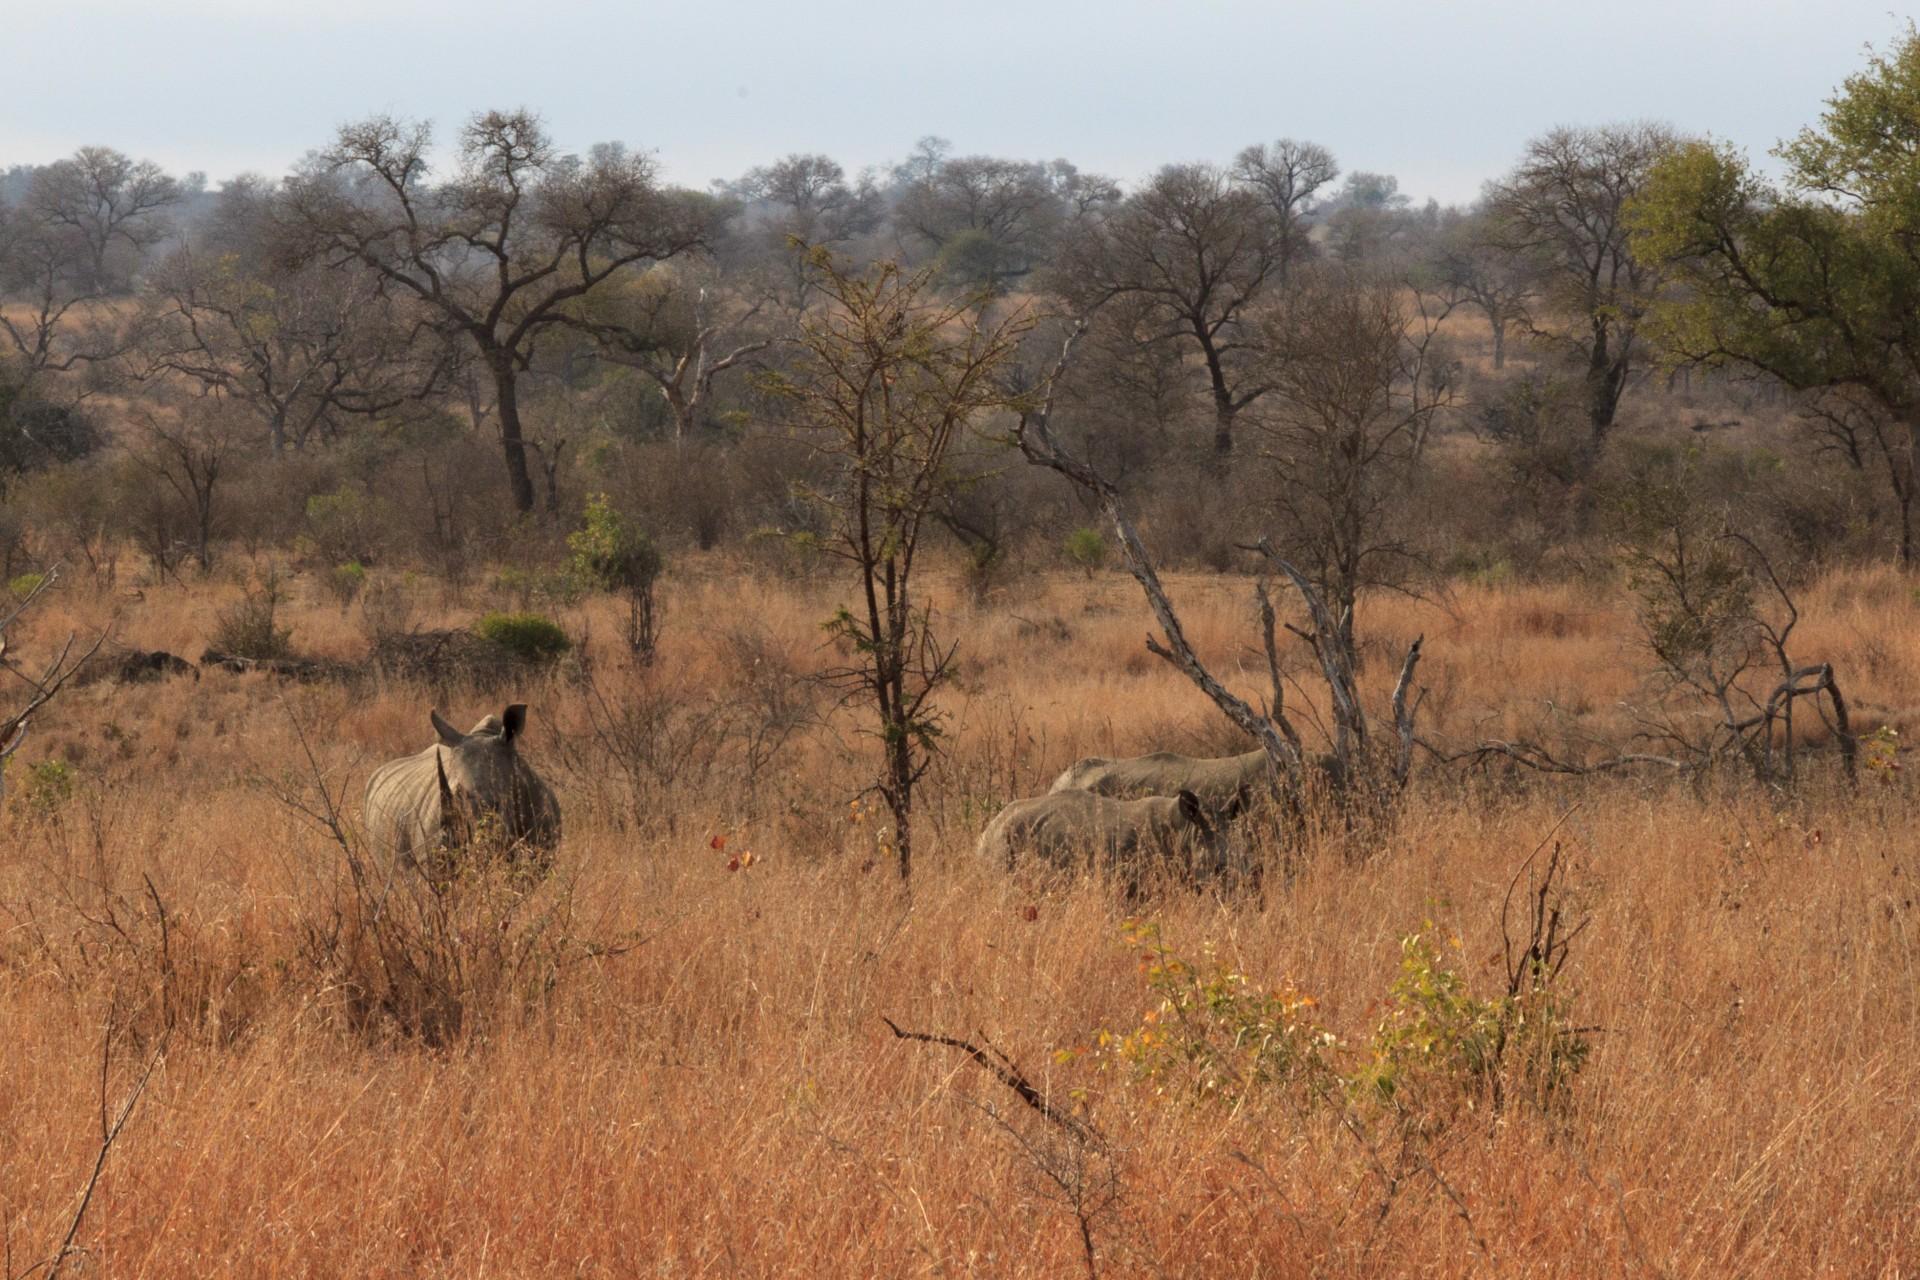 Rinoceronti nel bush del Kruger National Park